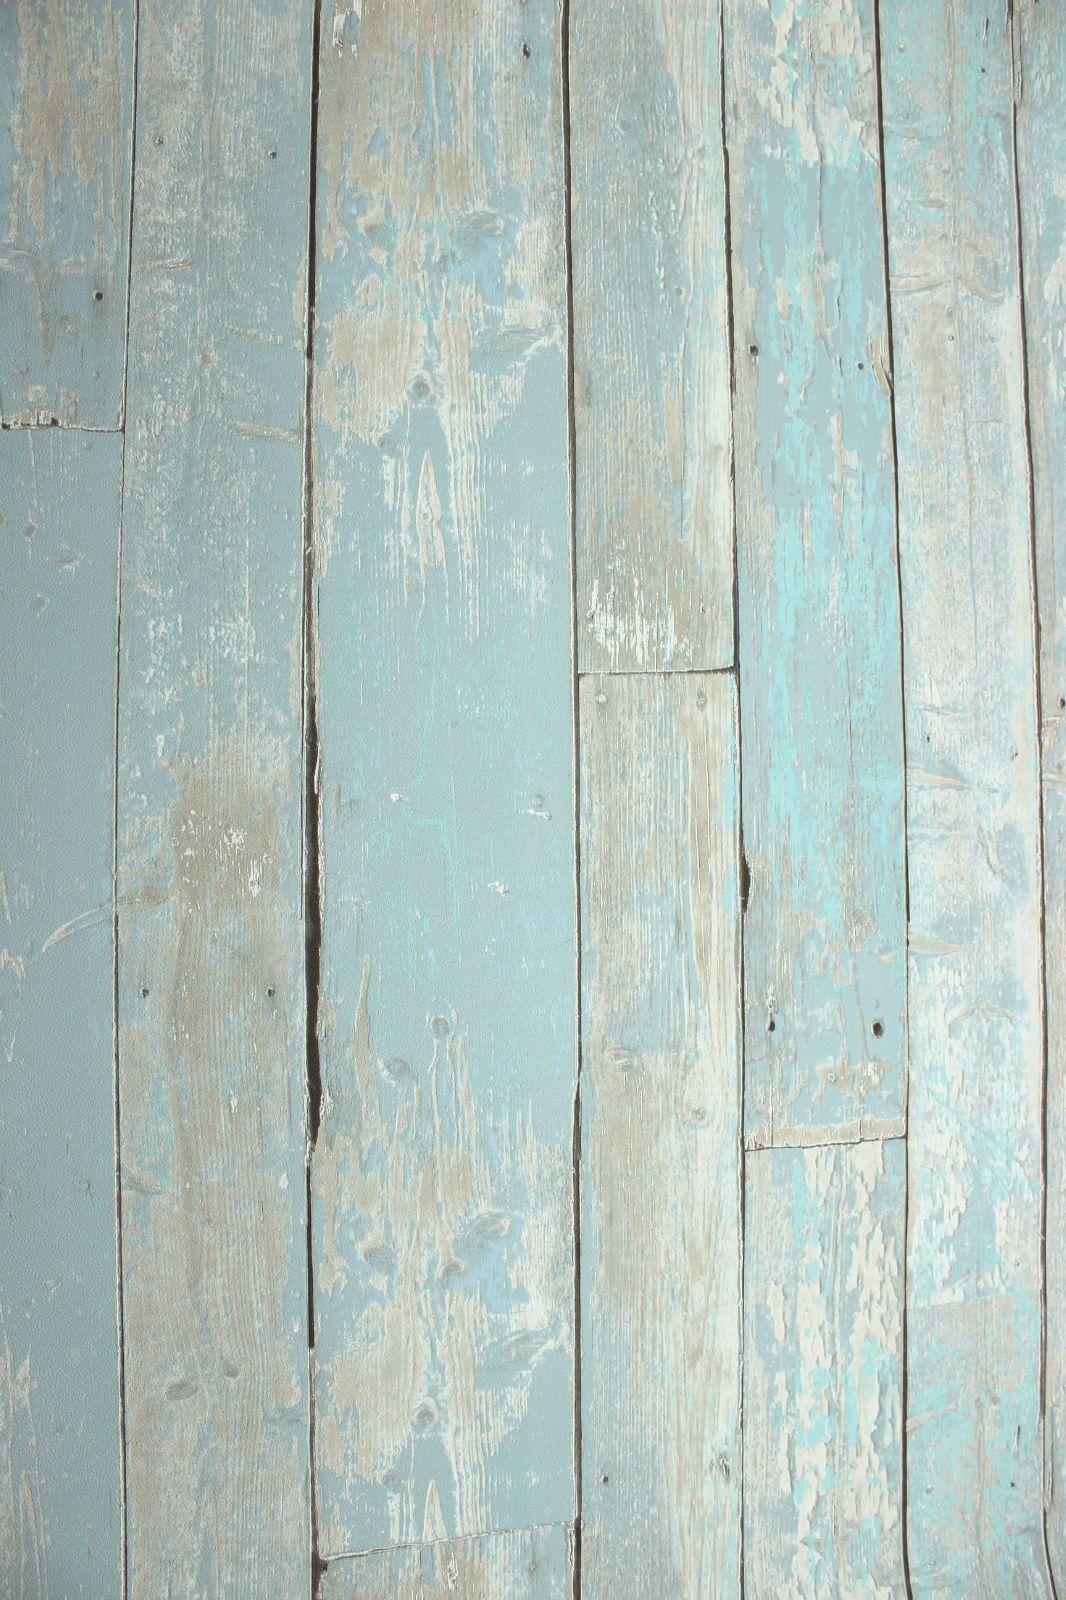 Vlies Tapete Antik Holz Rustikal Blau Türkis Beige Bretter Verwittert | EBay